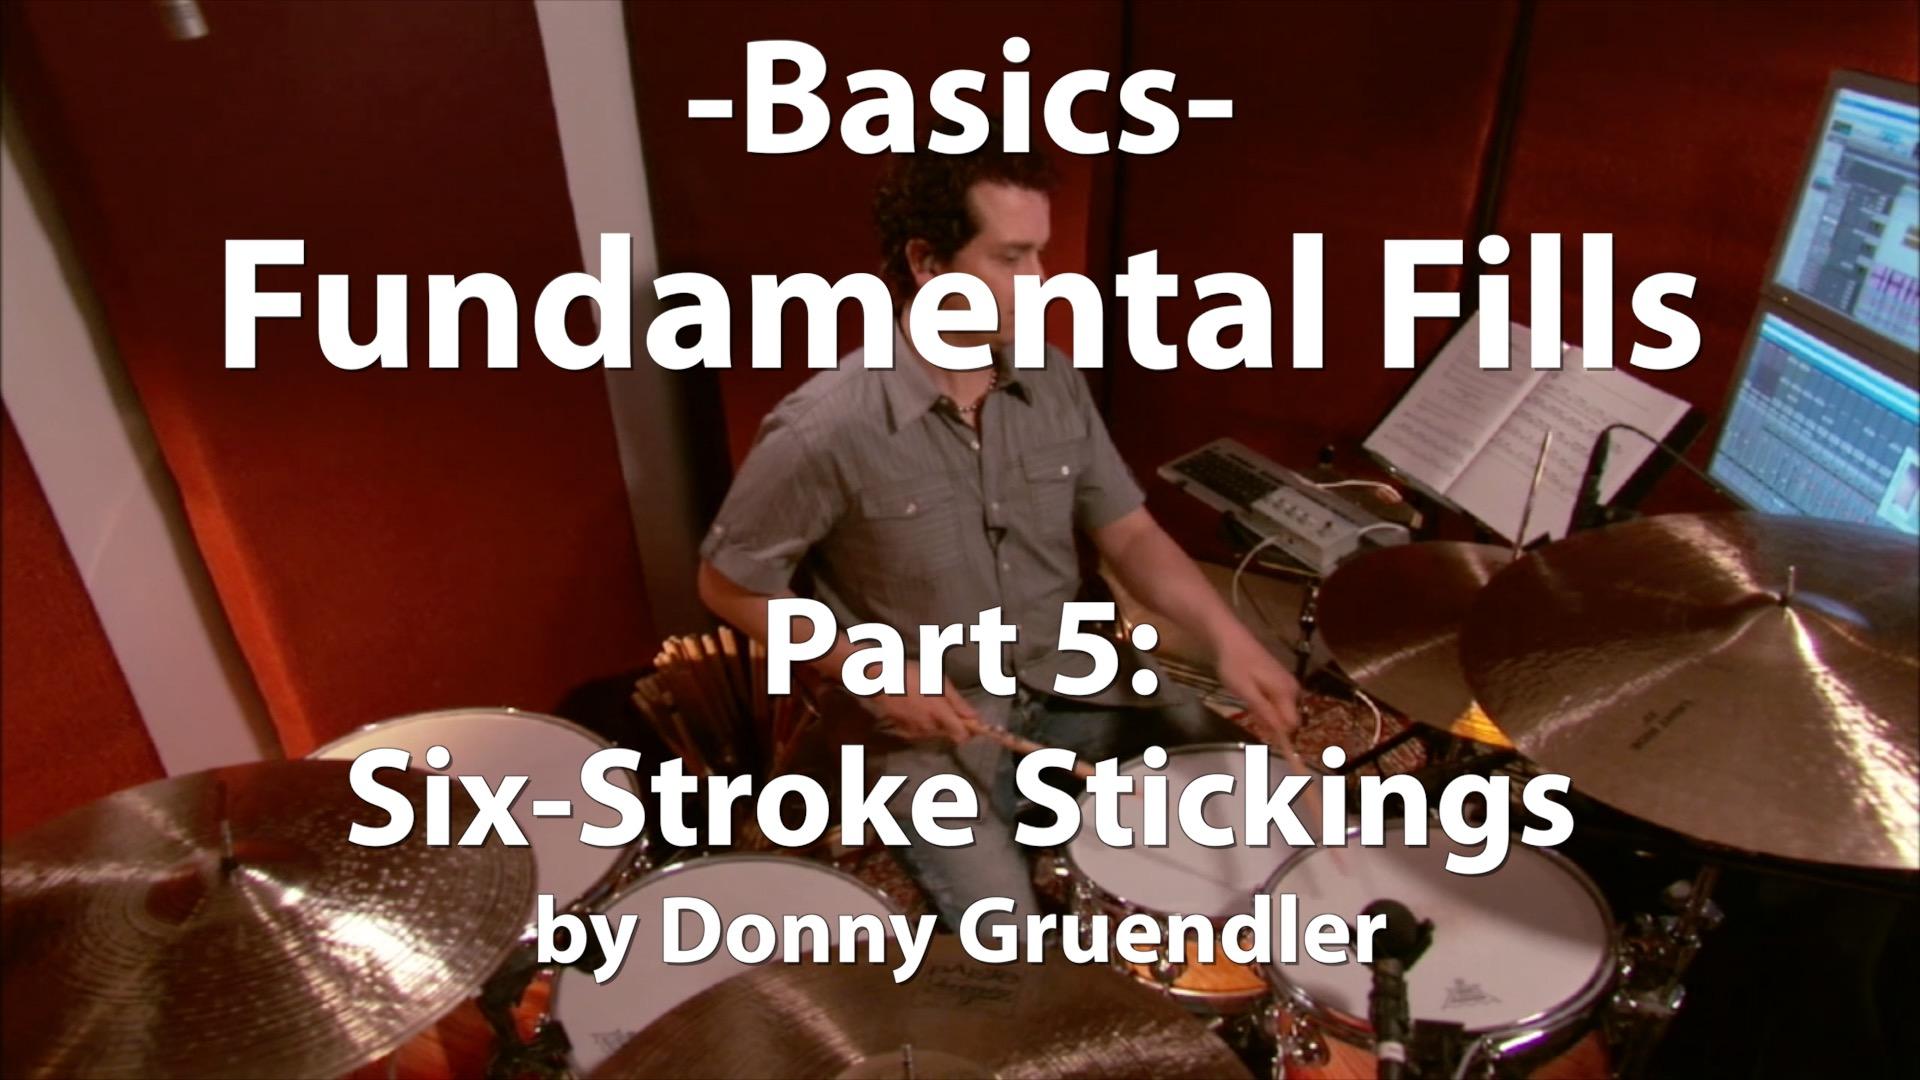 Basics Fundamental Fills Part 5 Six-Stroke Stickings